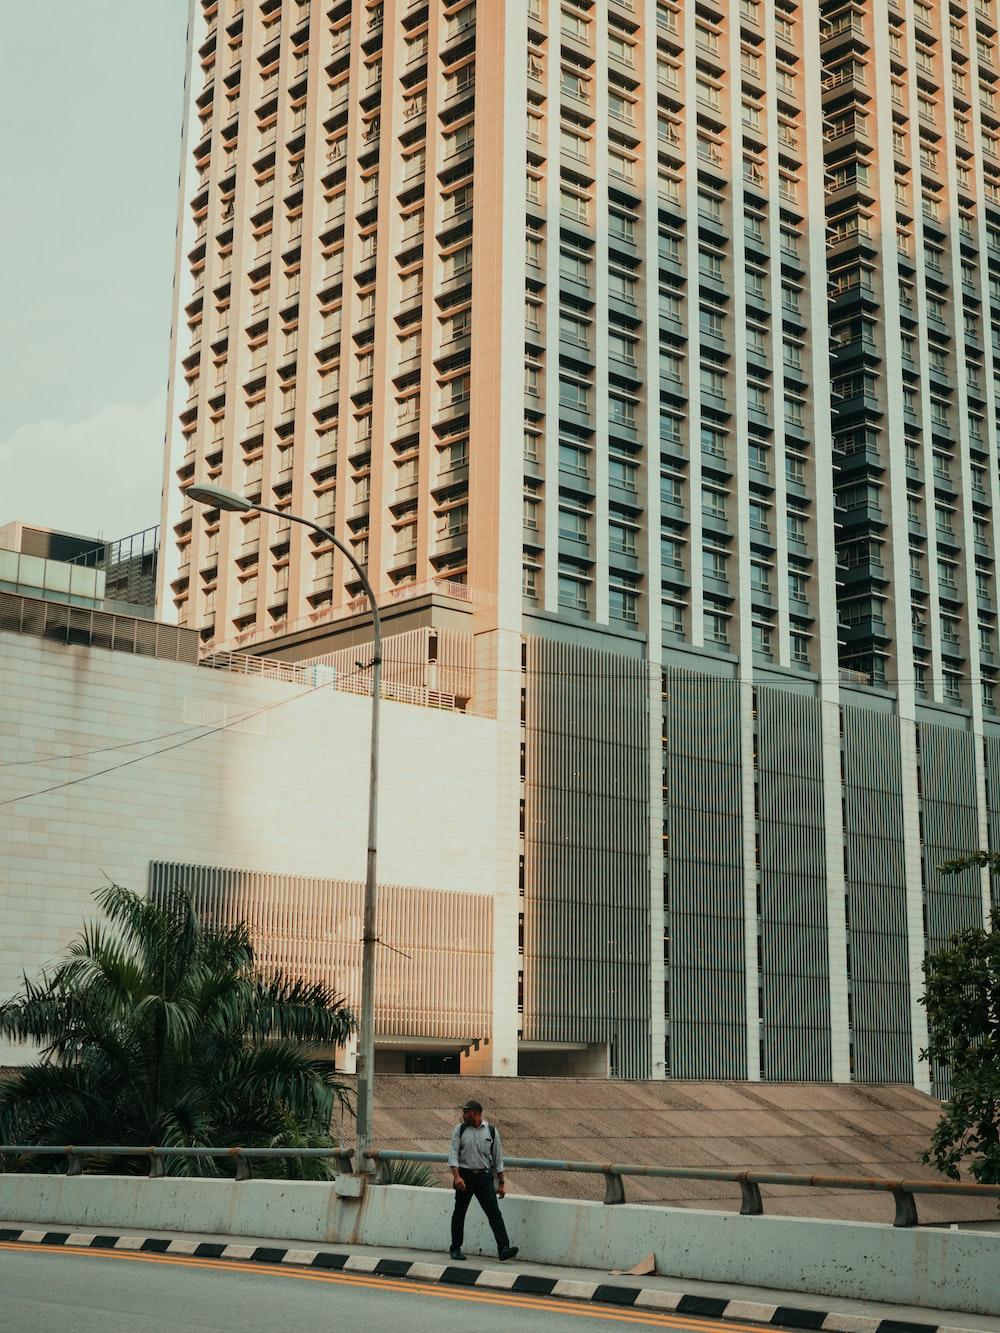 man walking on a concrete bridge in the city